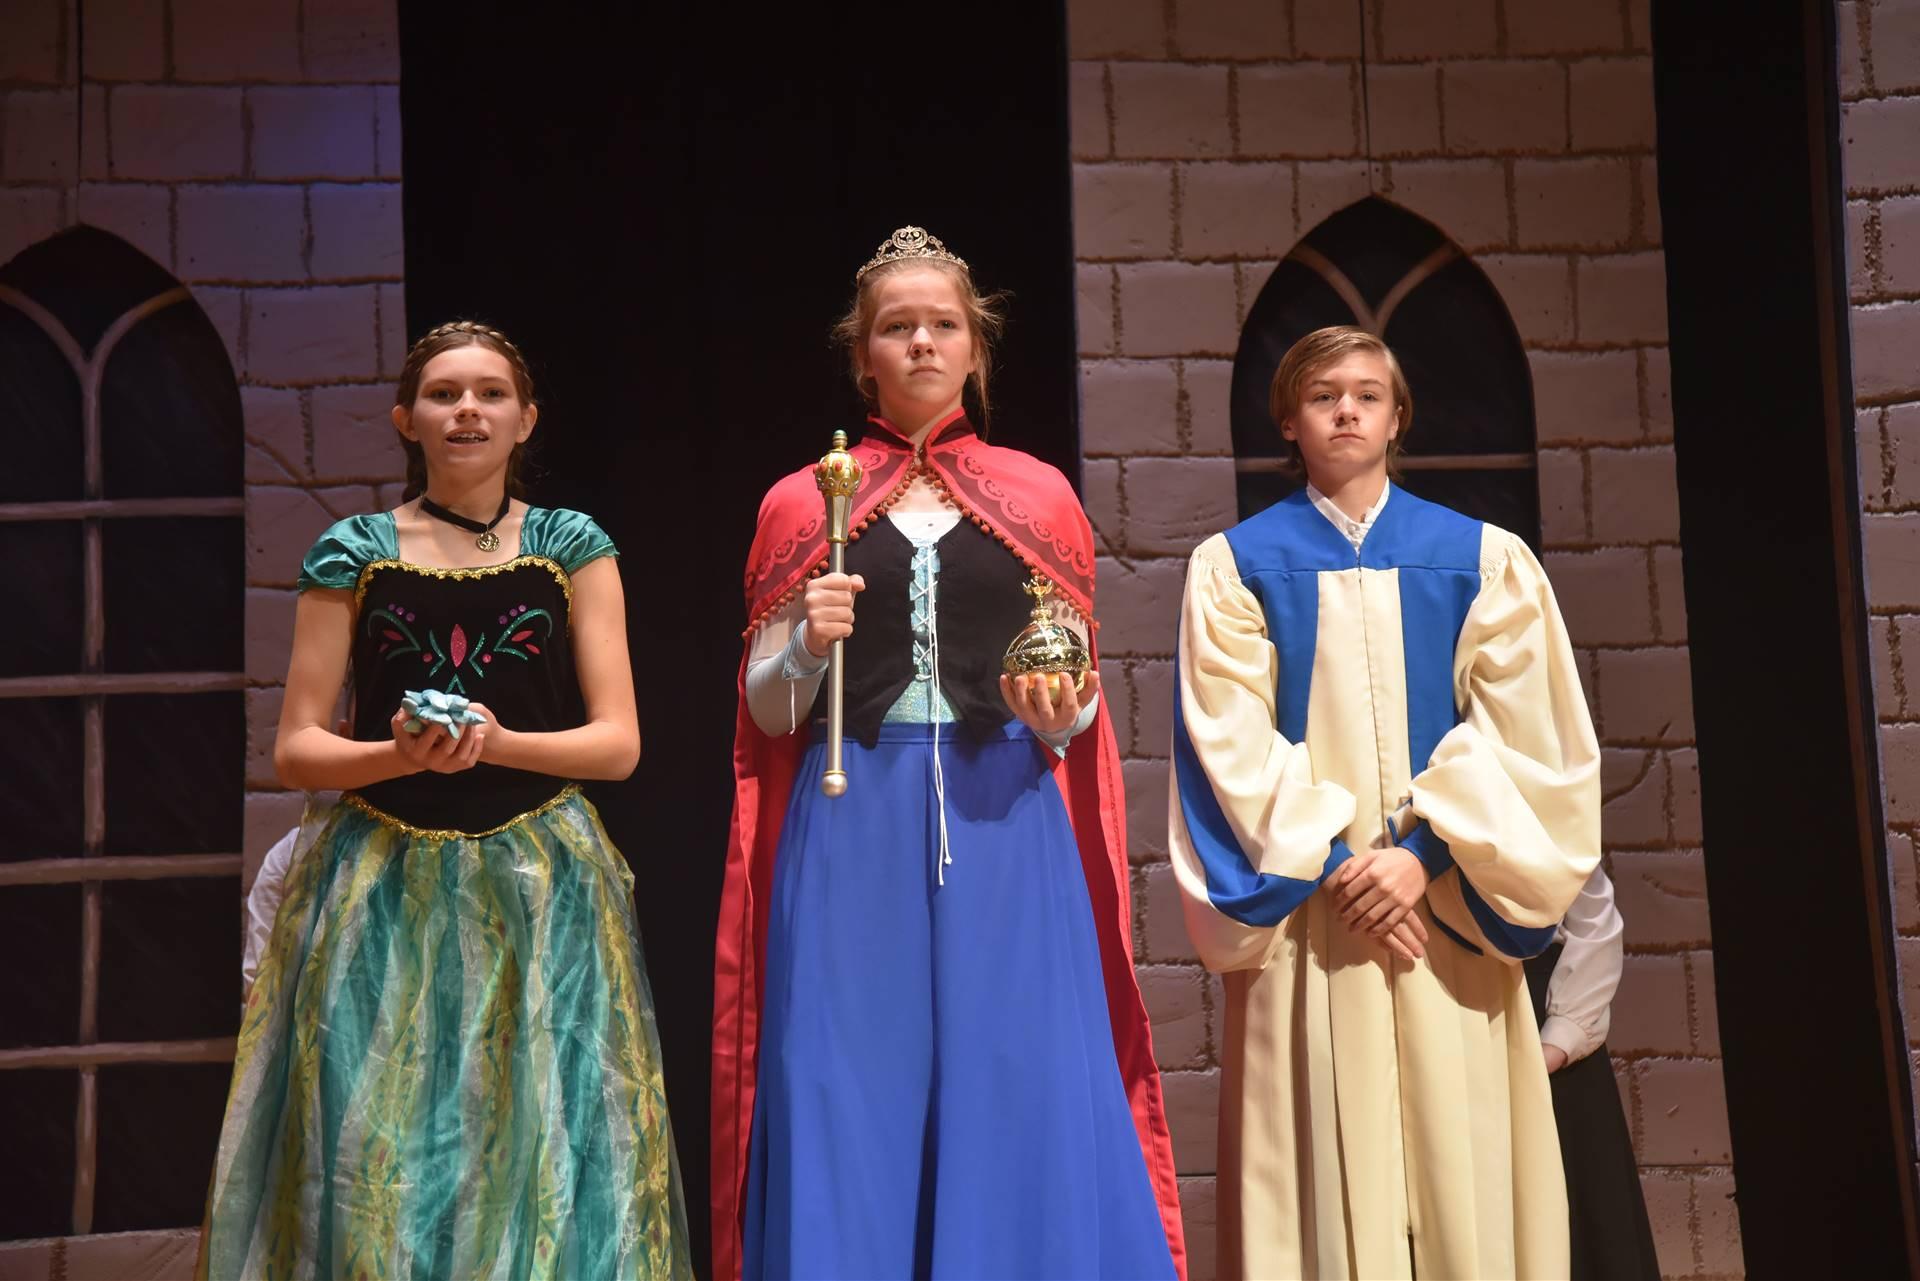 Elise becomes Queen